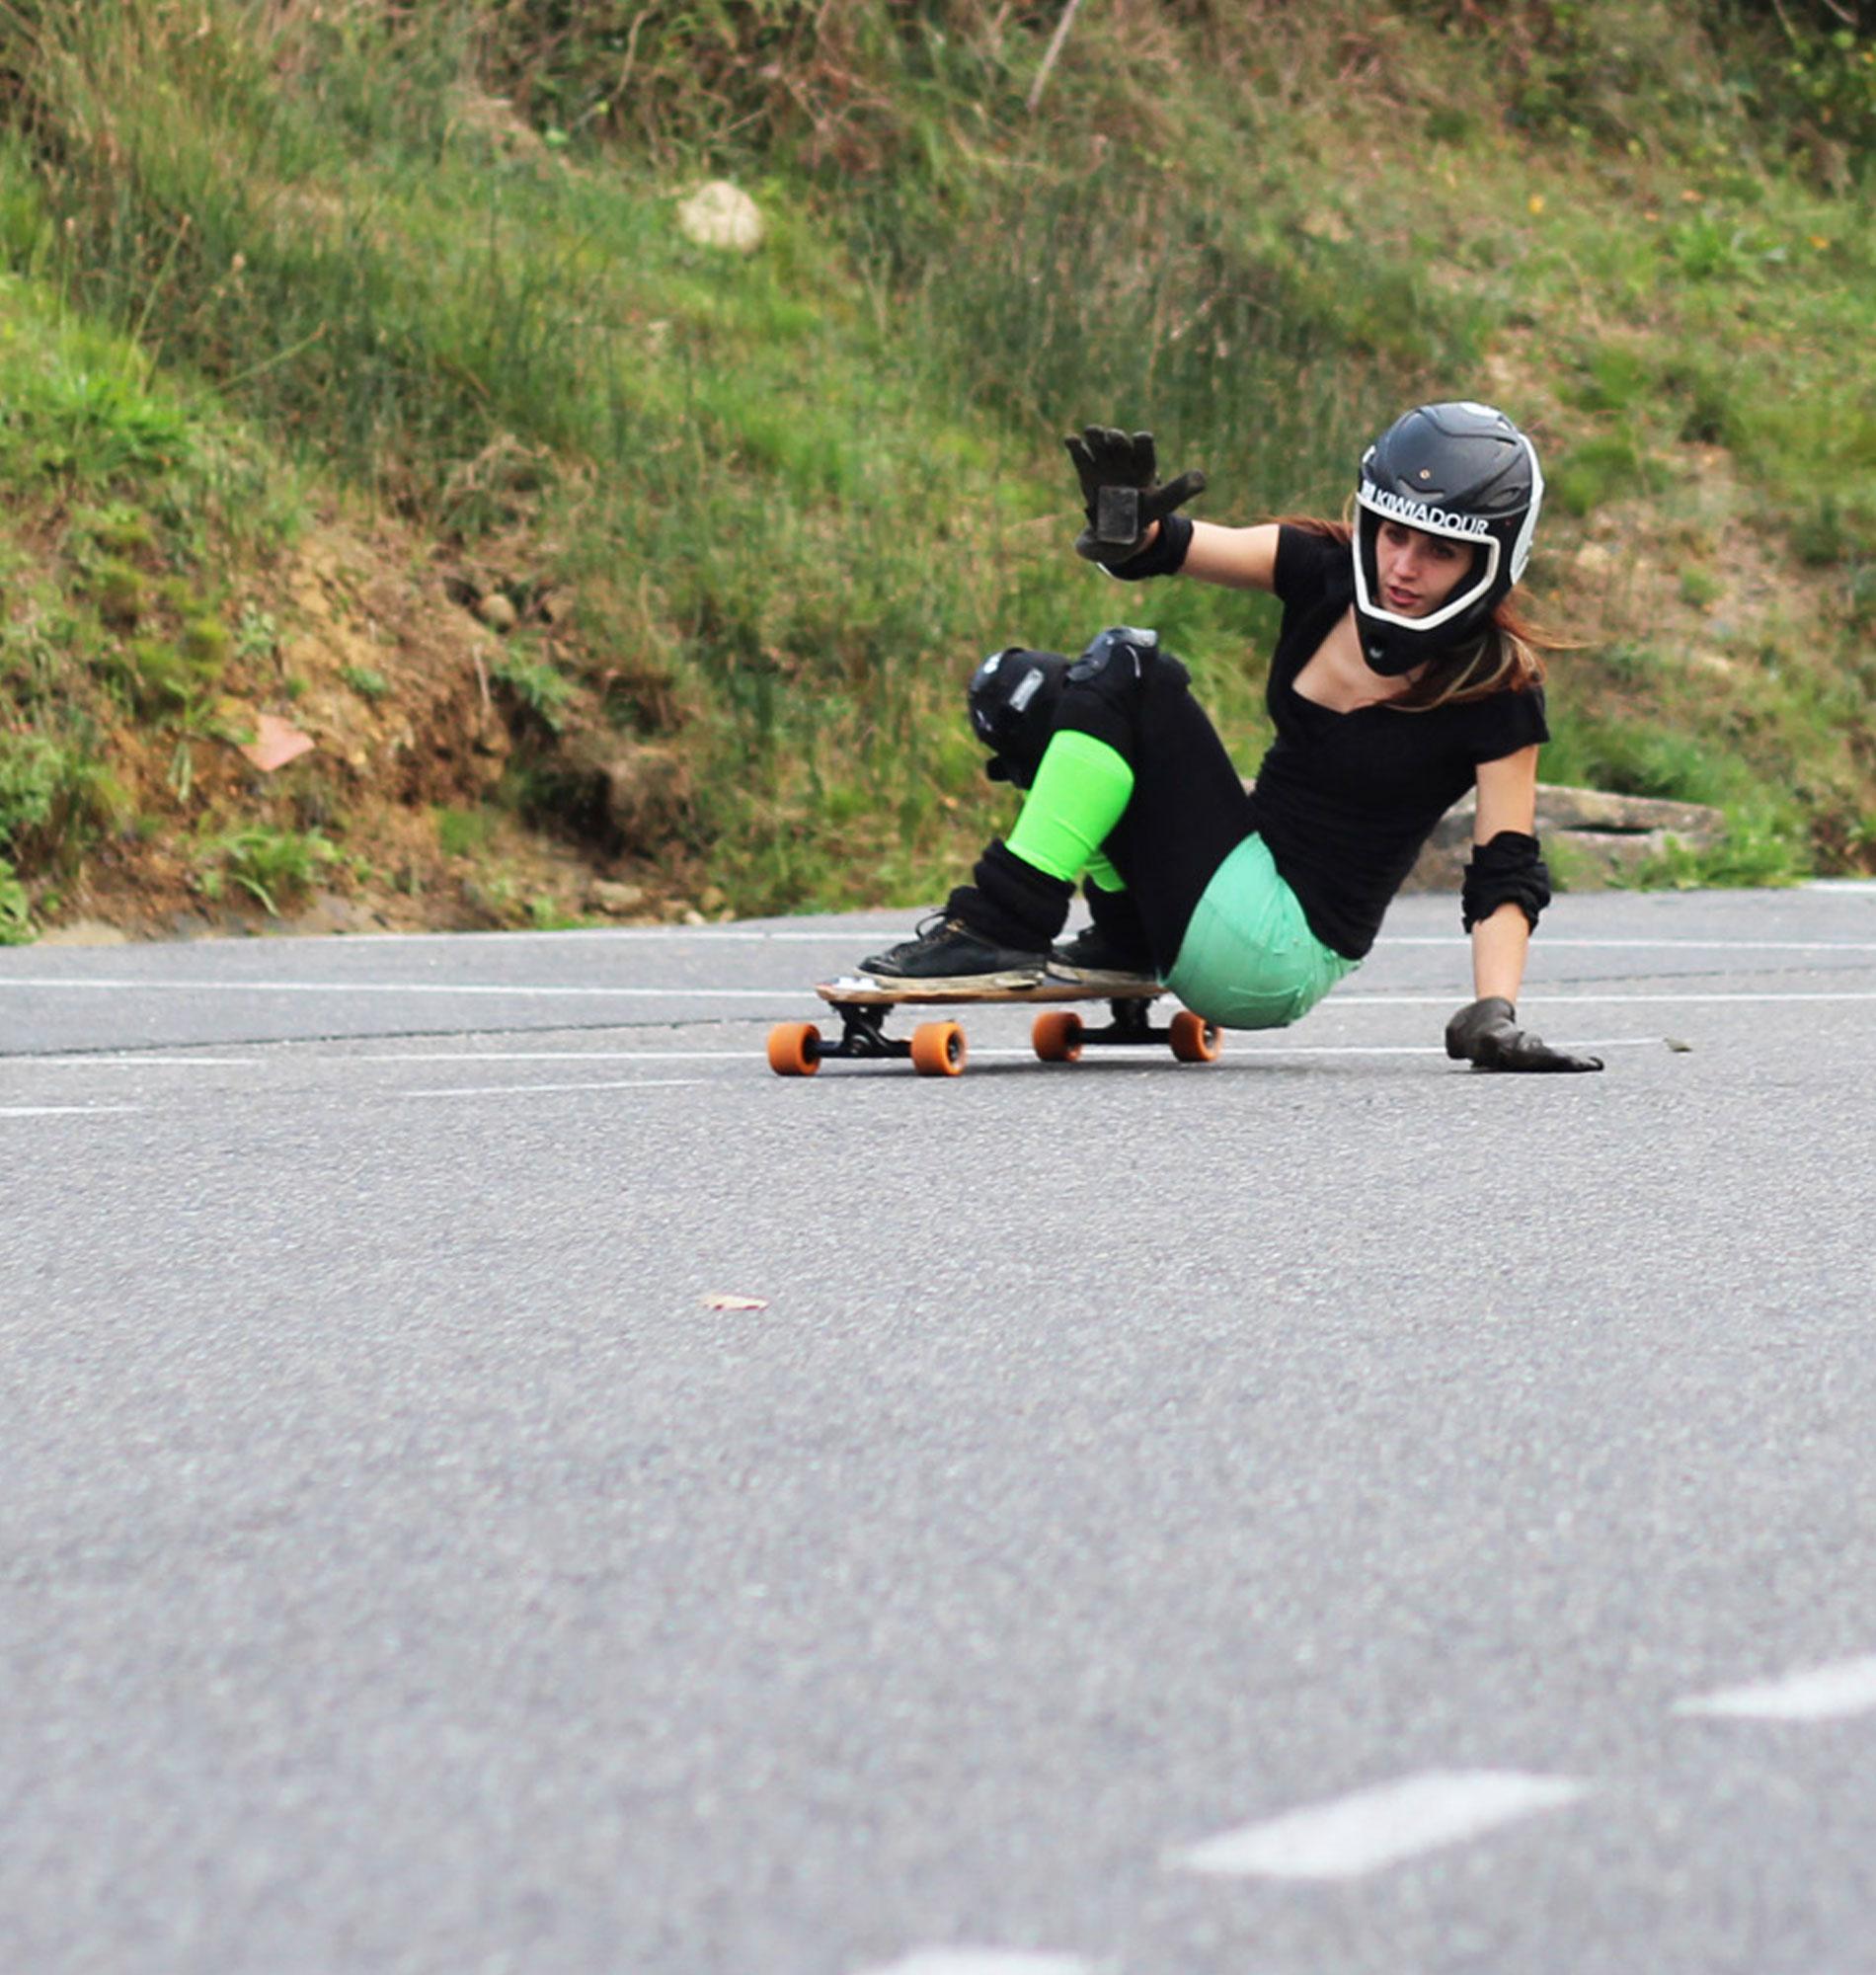 Skate freeride à Biarritz